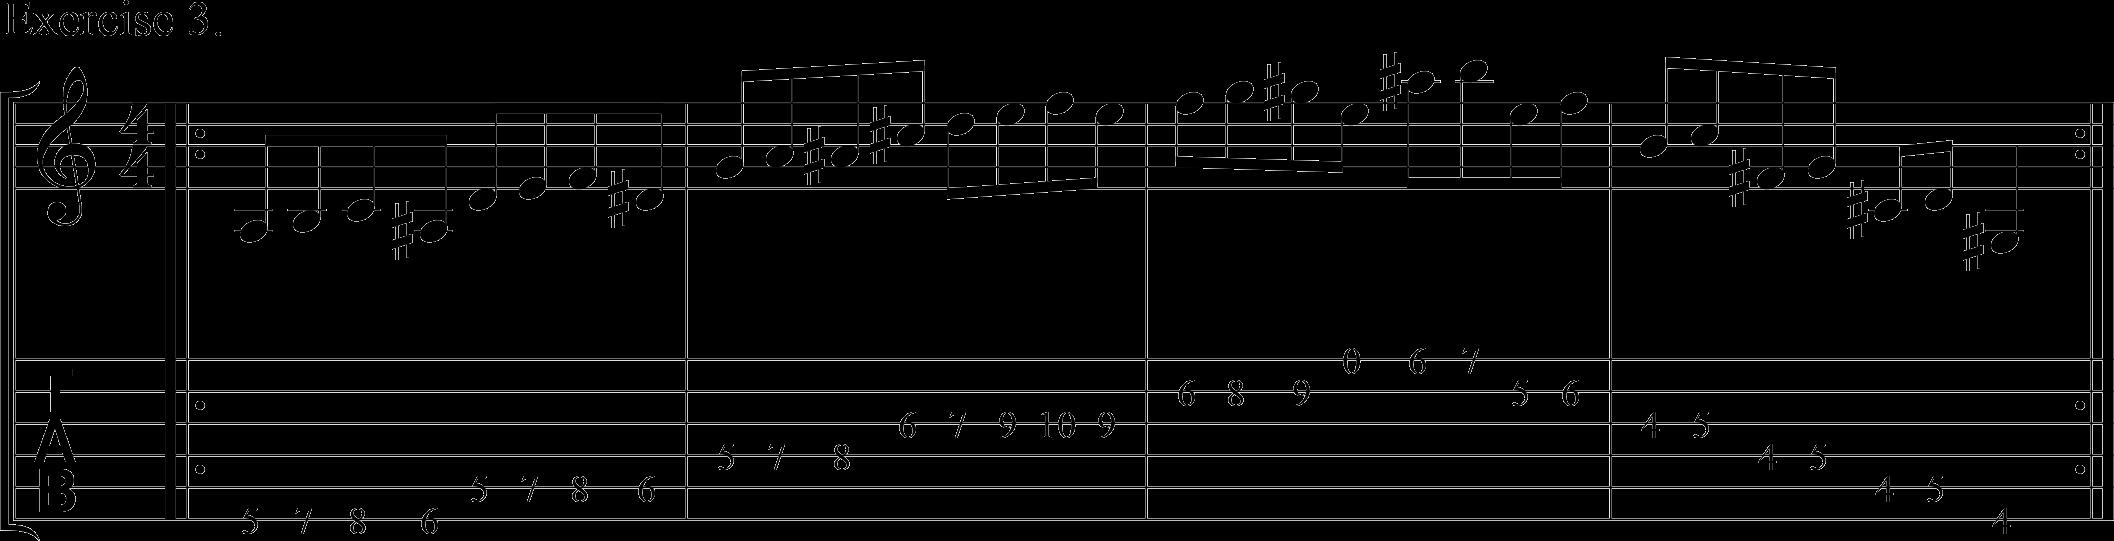 Downpicking using chromatic notes.